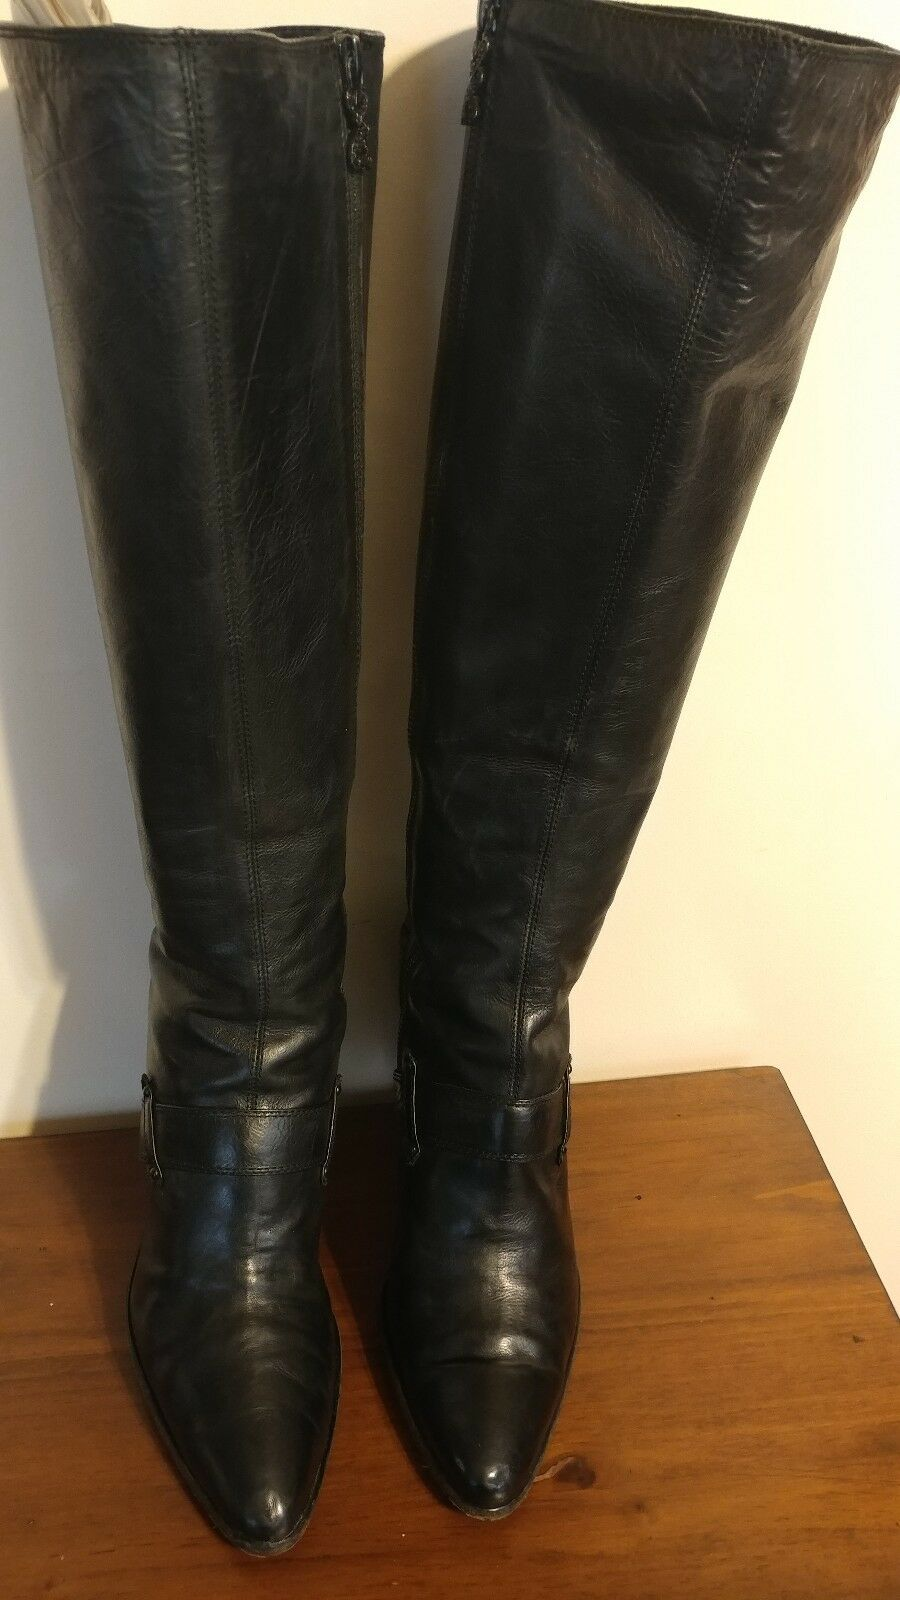 Modern Vintage KITTIE schwarz tall boots sz. 9.5 pre-owned